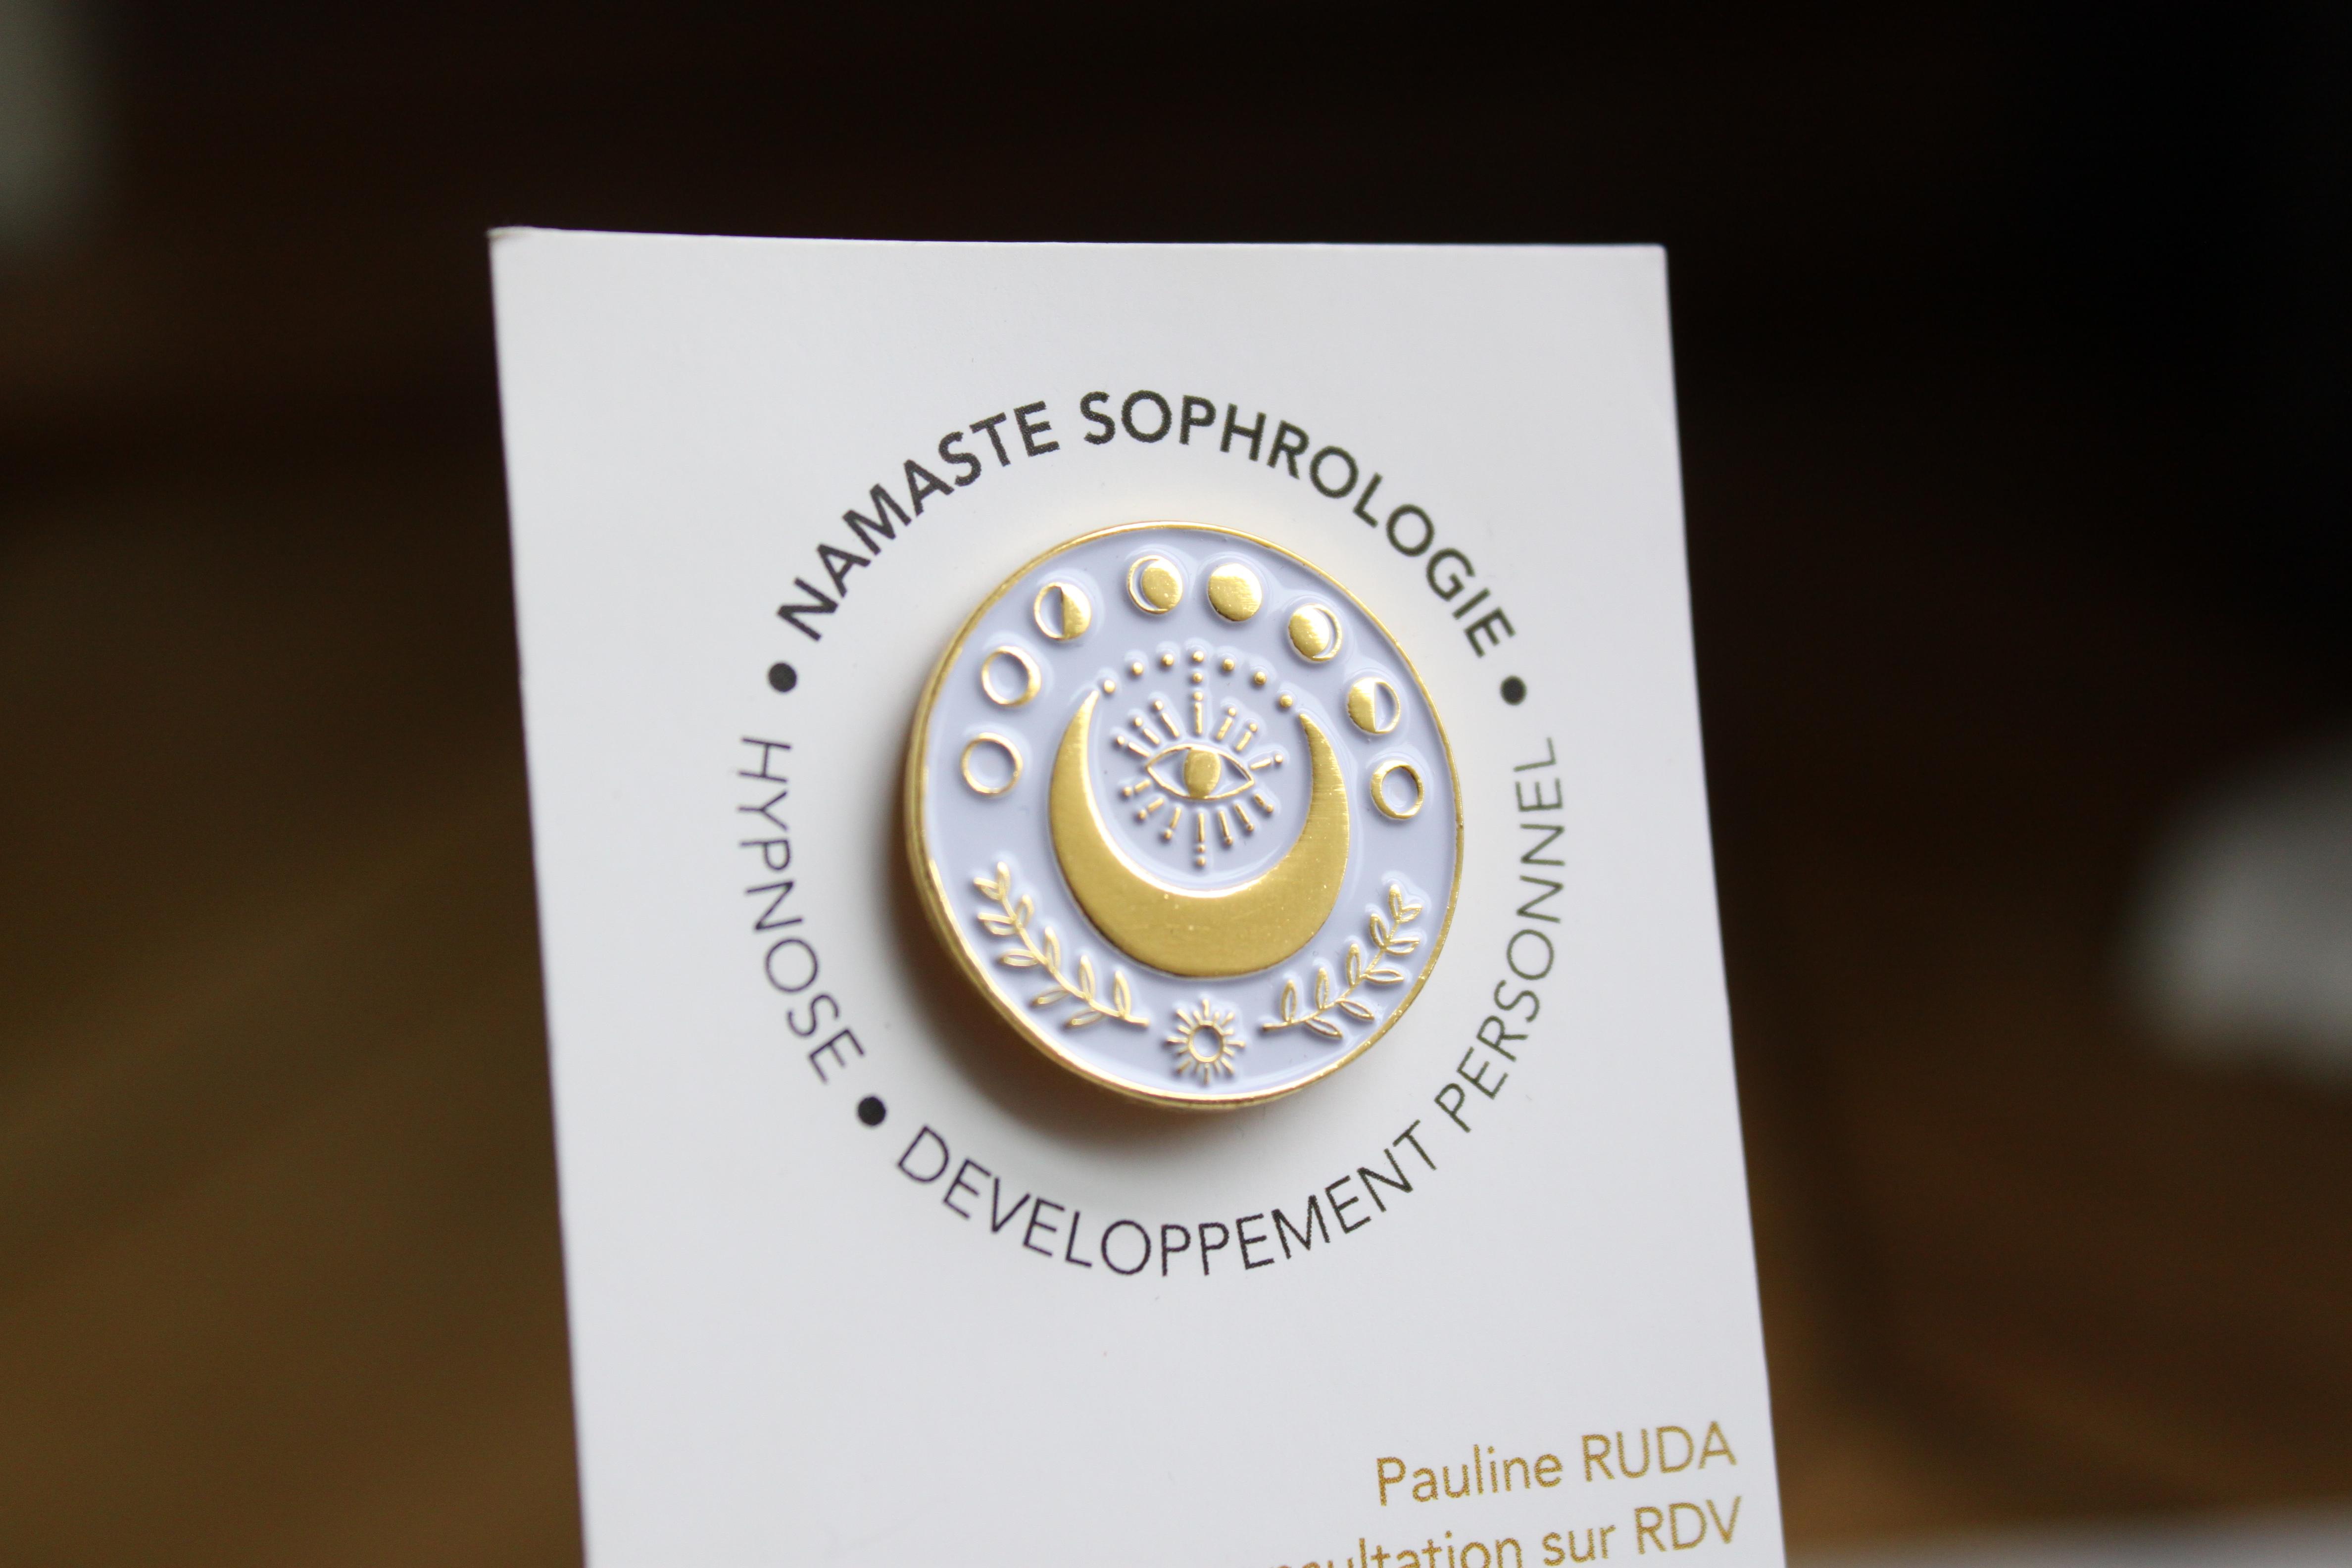 namaste sophrologie pin's